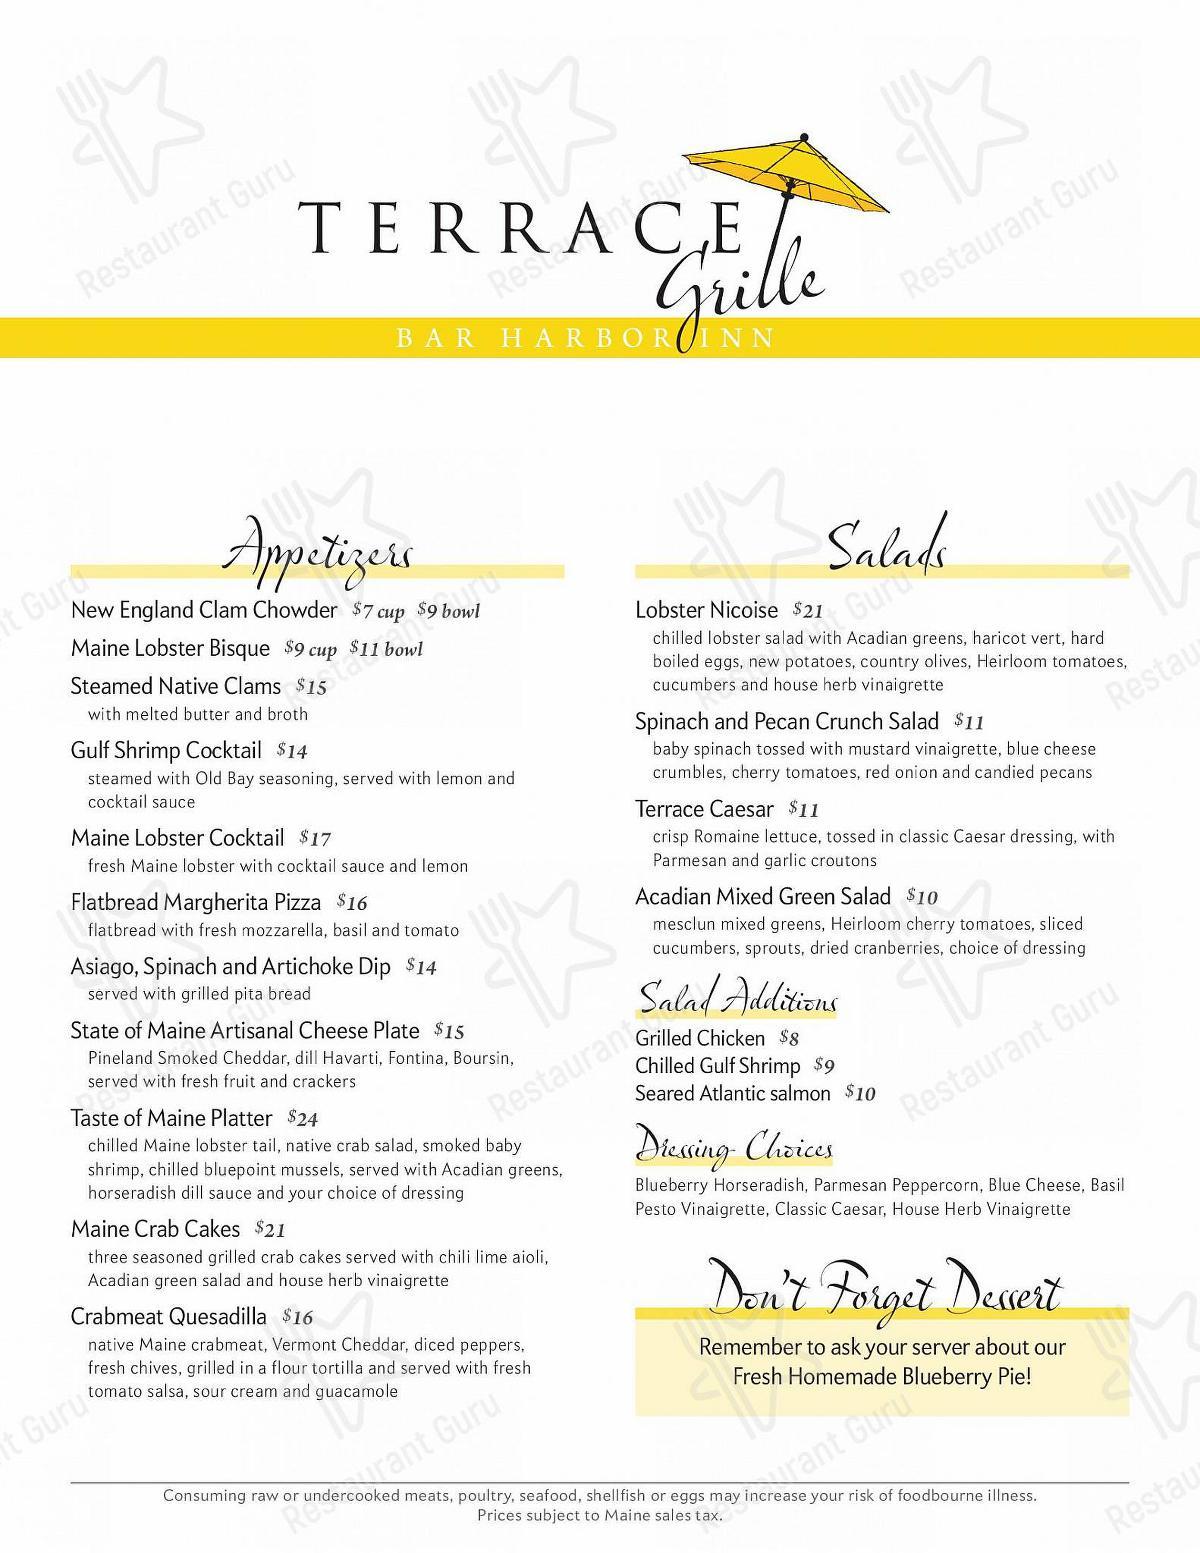 The Terrace Grille menu